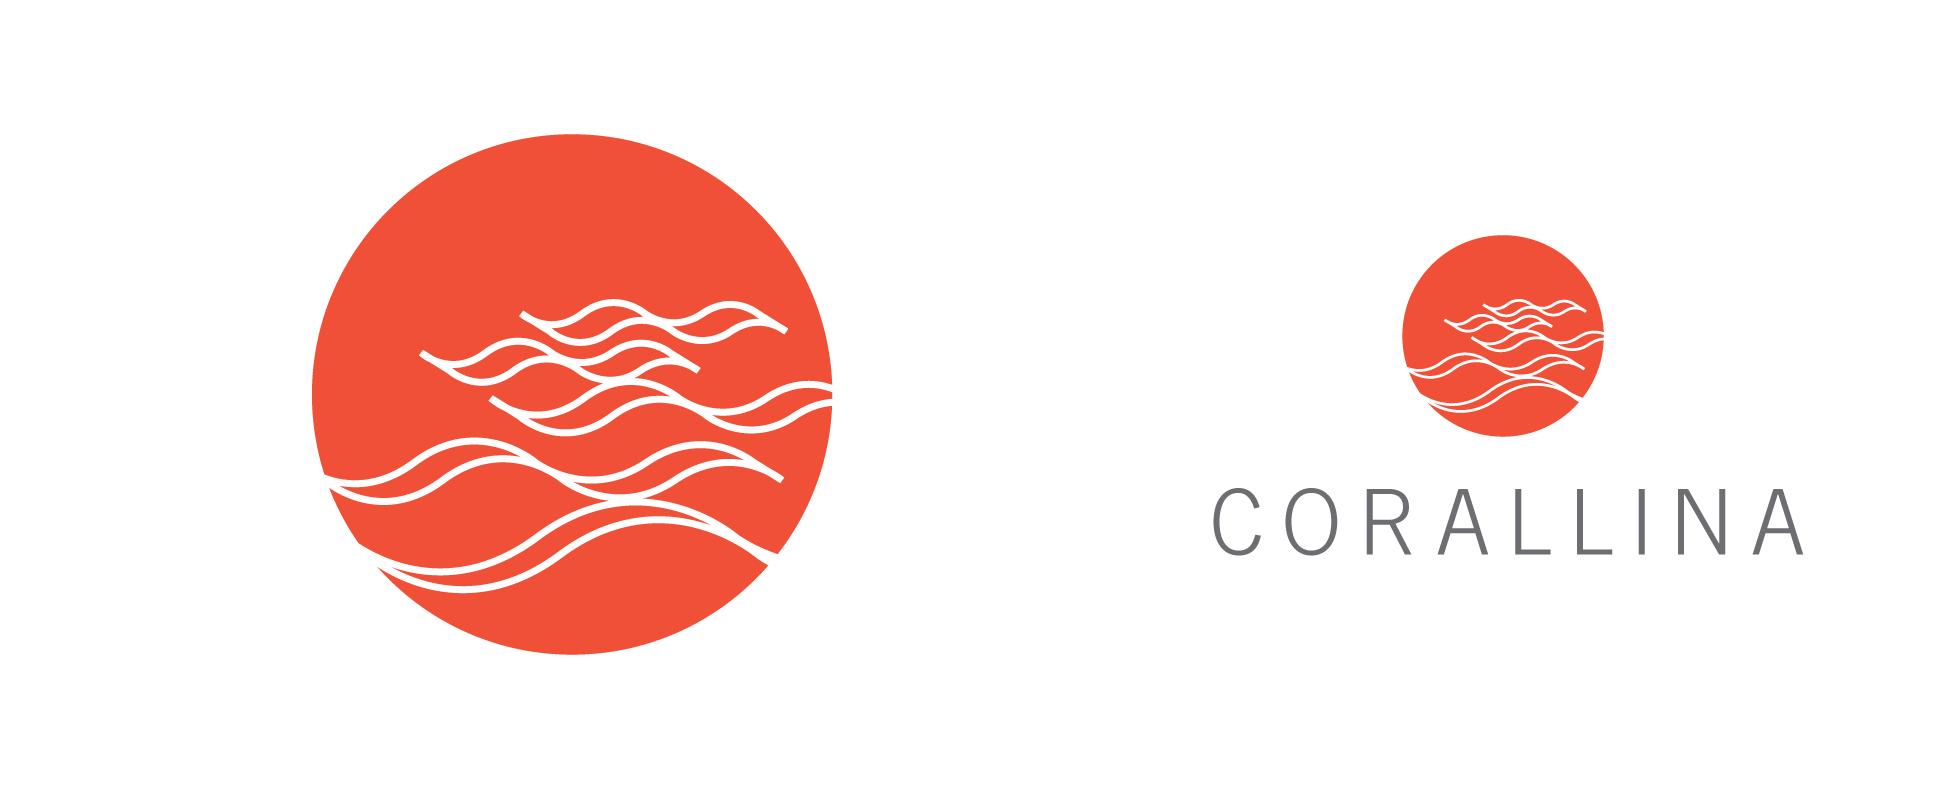 Corallina-01.jpg